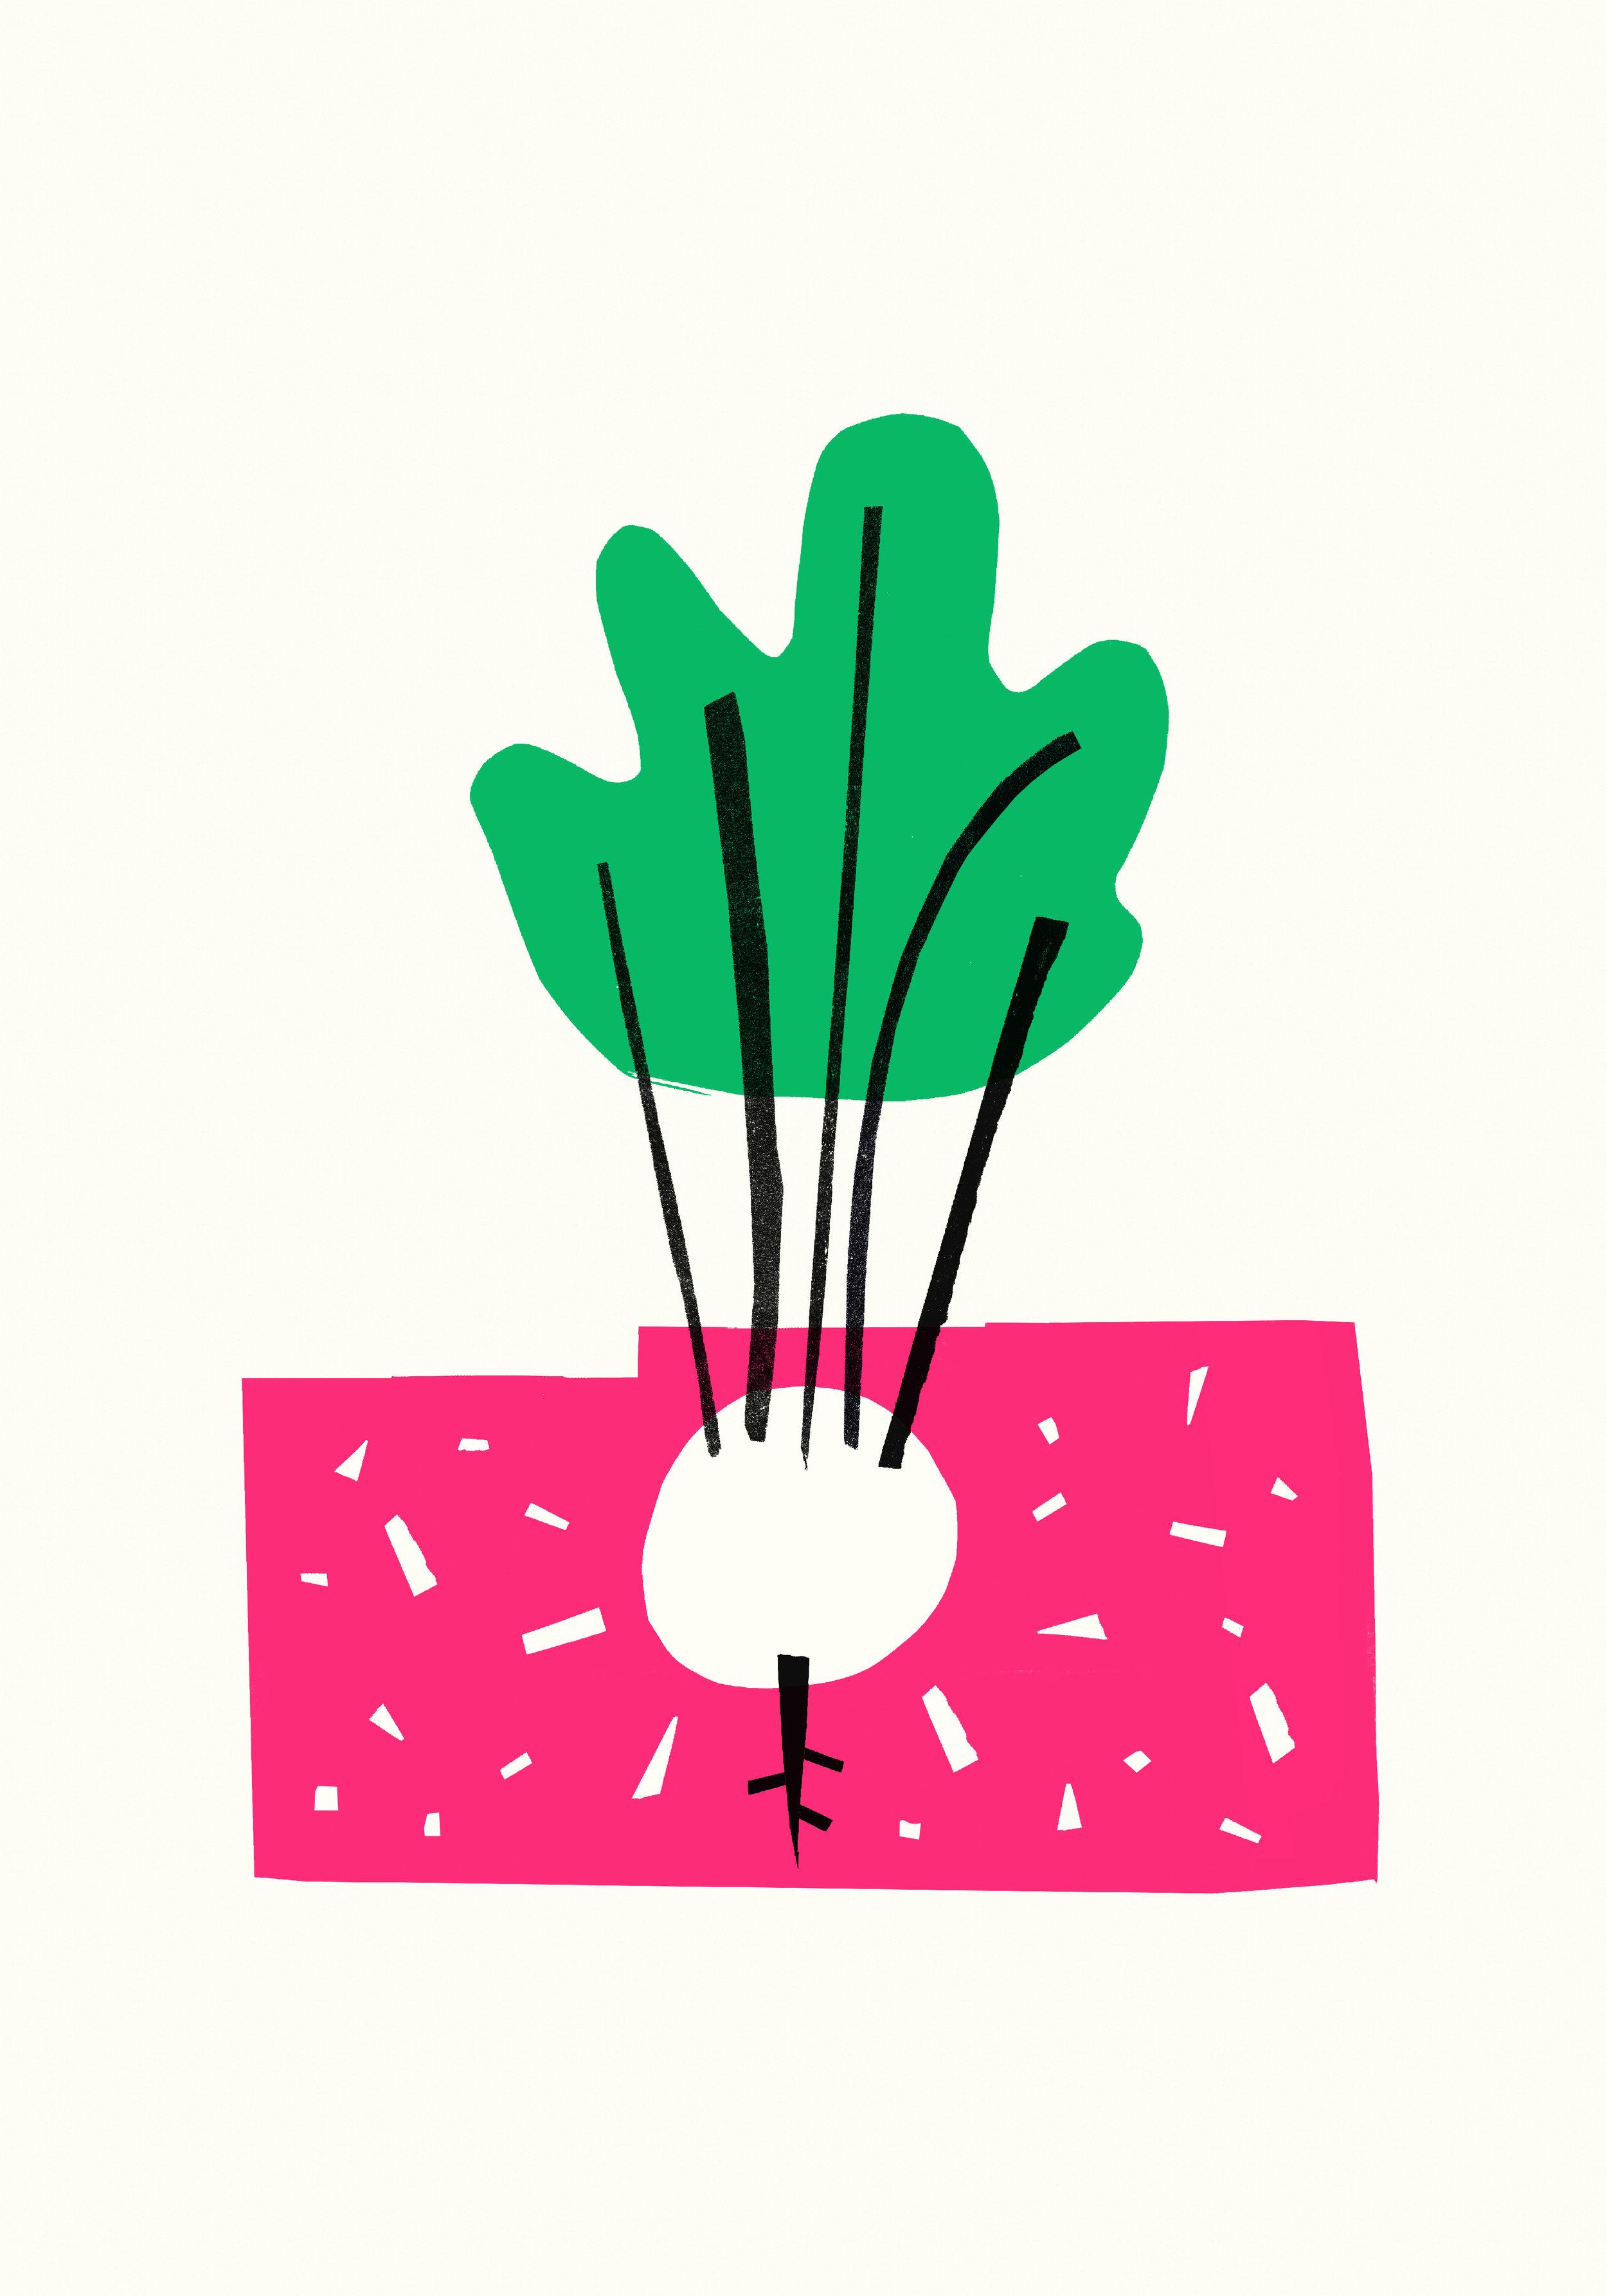 2. LucyHowarth-ArtWork2-EARTHYBEET.jpg